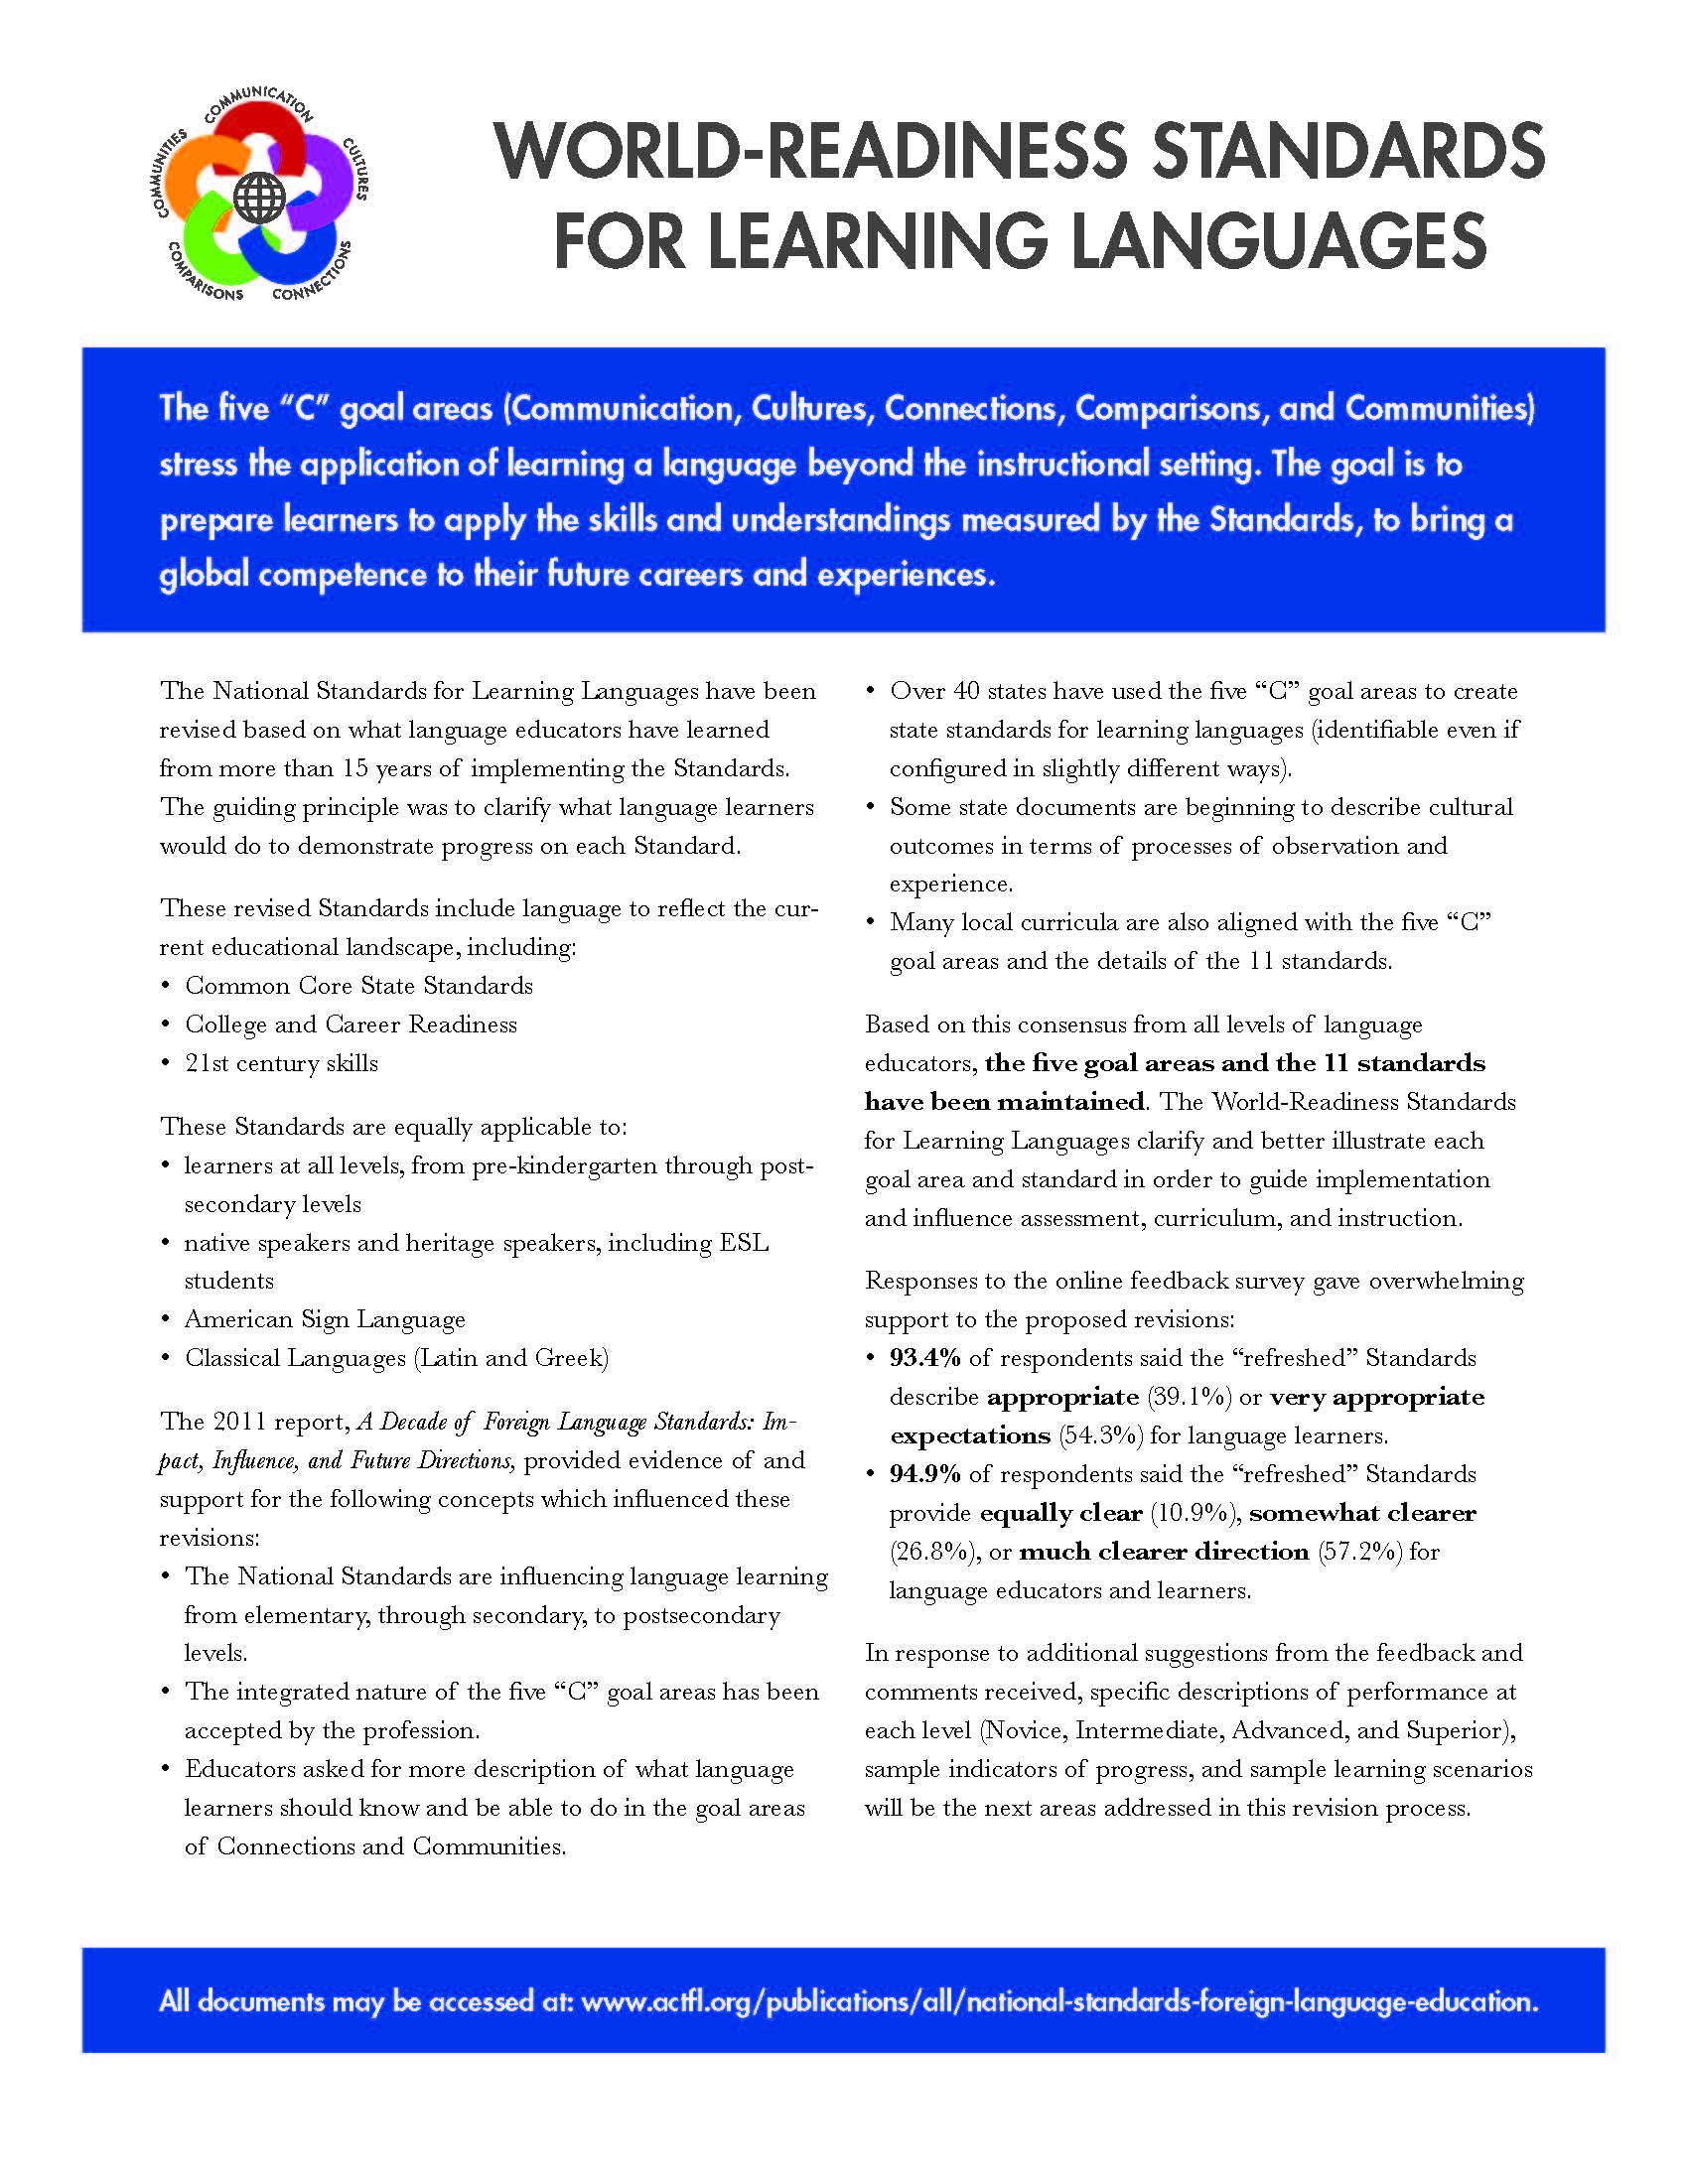 World-ReadinessStandardsforLearningLanguages_Page_2